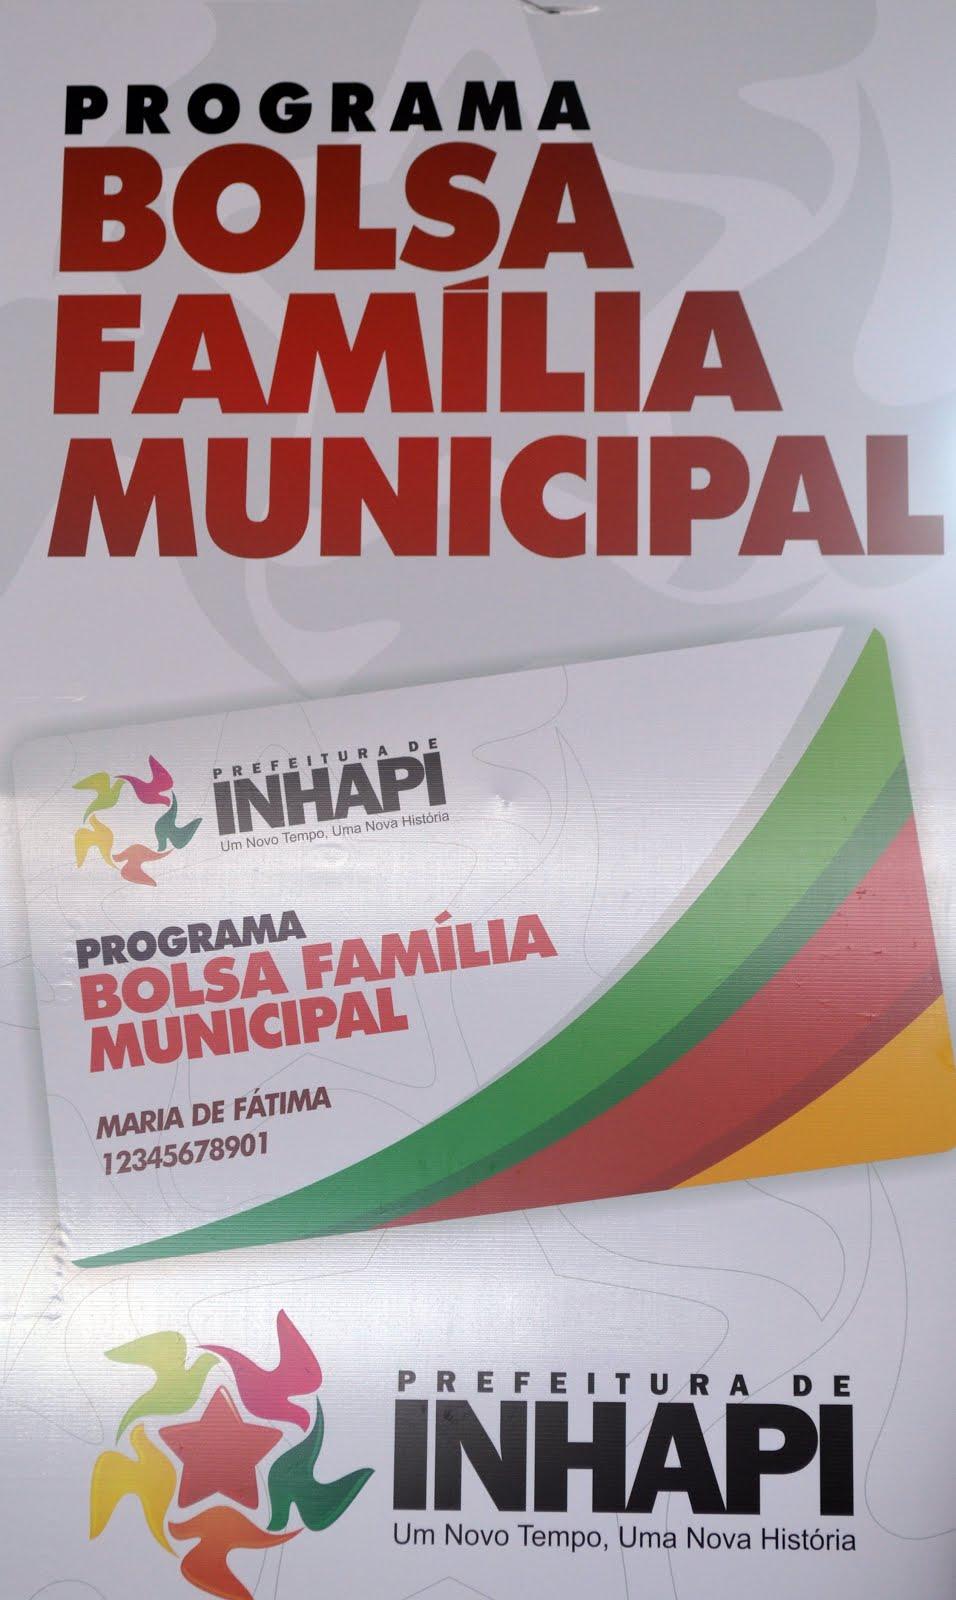 Bolsa Família Municipal